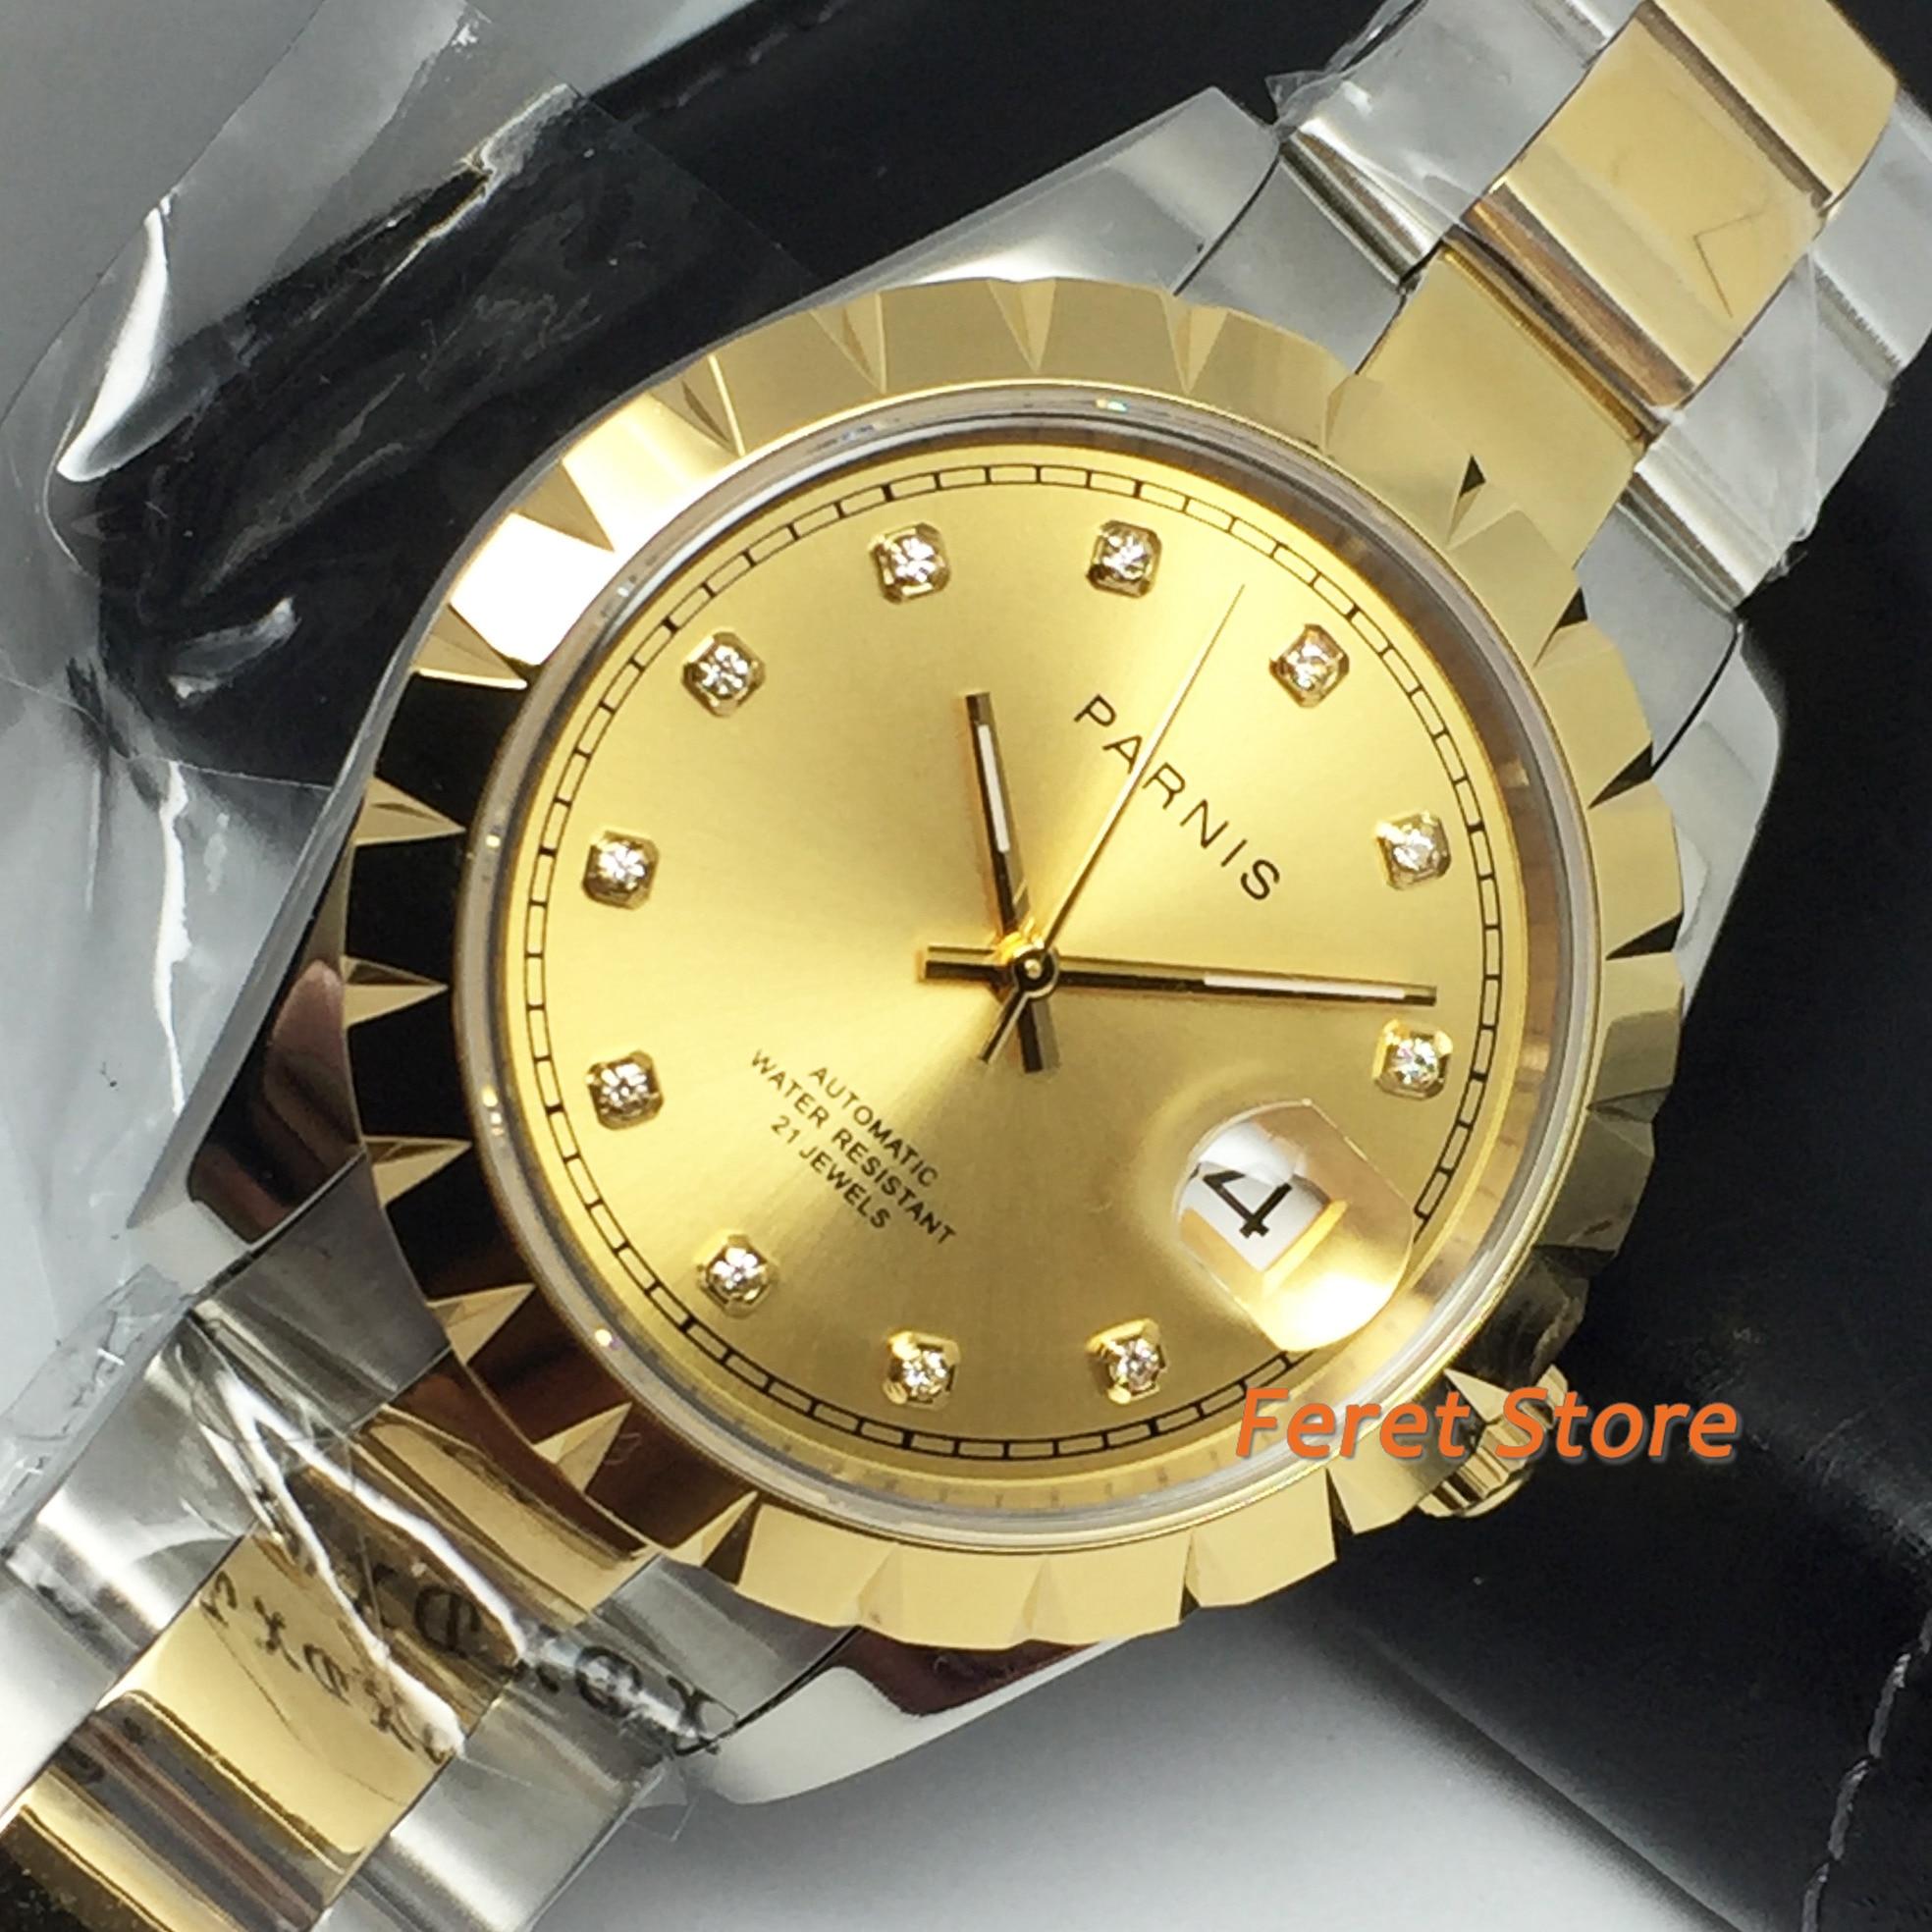 Parnis 39mm 2020 camiseta nueva carcasa dorada zafiro cristal esfera de oro abertura para fecha 21 joyería mecanismo Miyota reloj automático para hombre